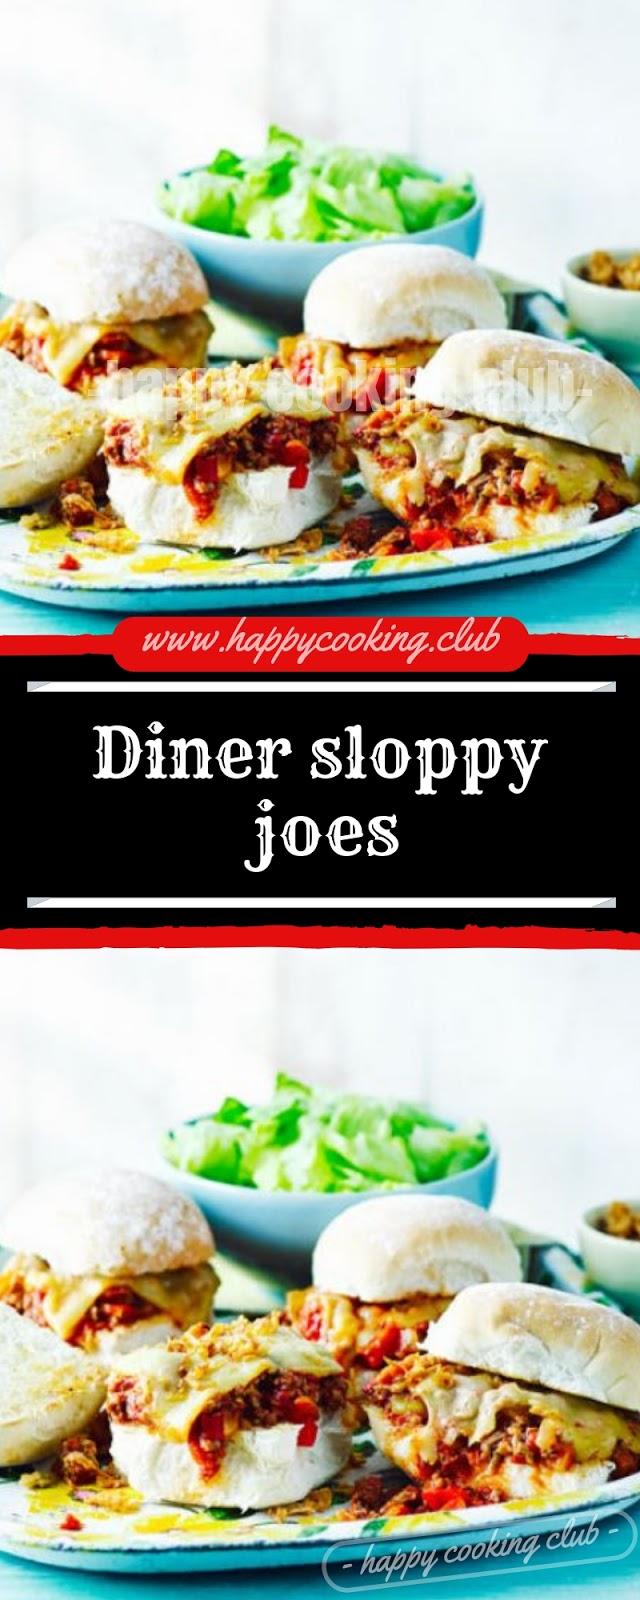 Diner sloppy joes